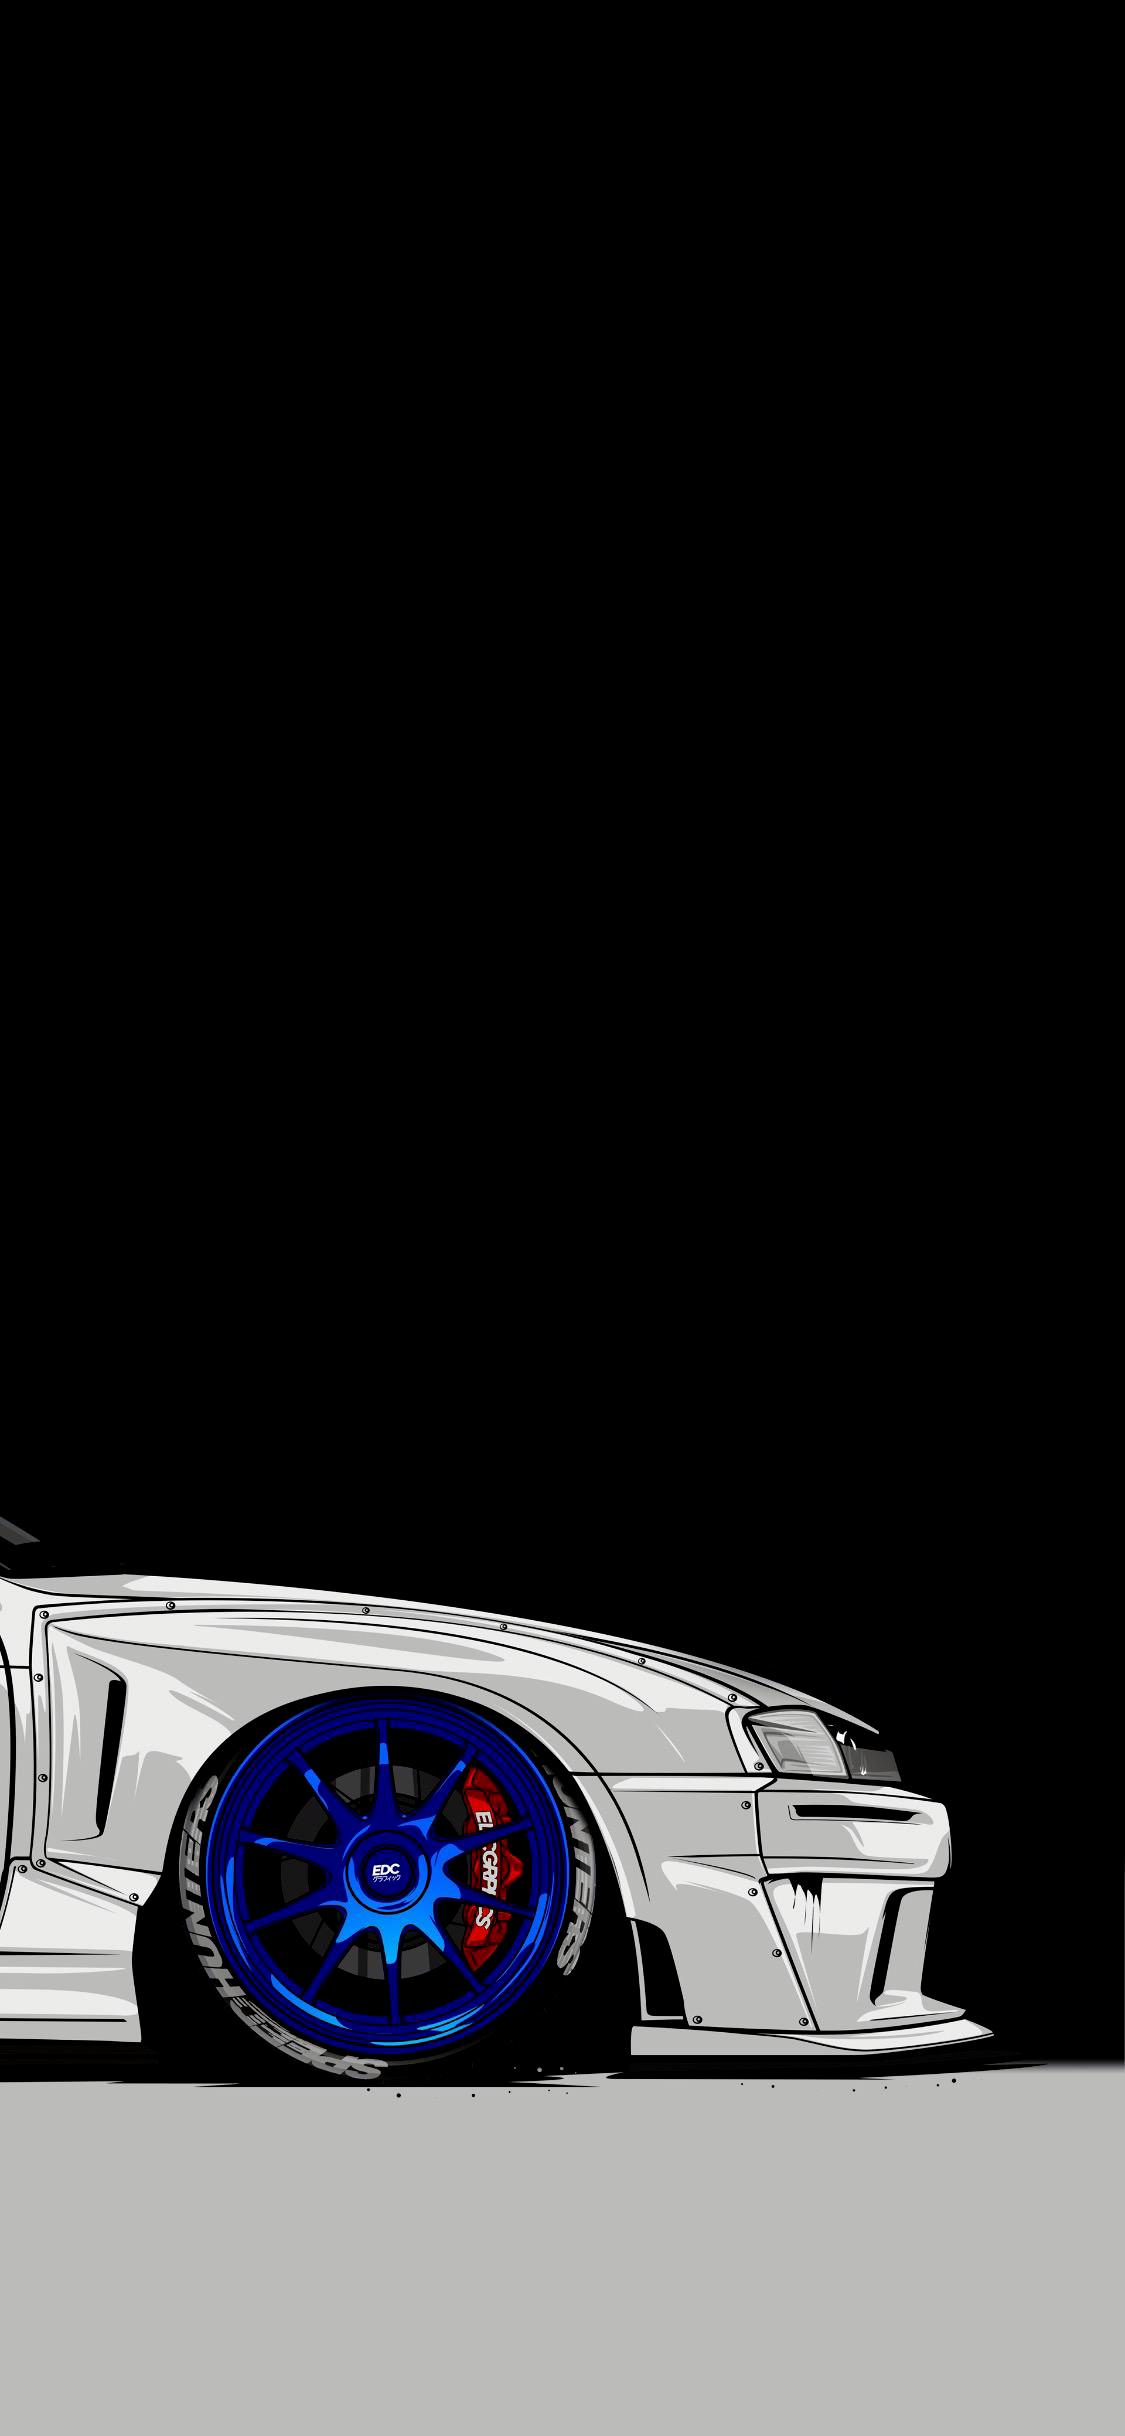 Pin By Martin On Car Drawing Art Cars Jdm Wallpaper Jdm Cars